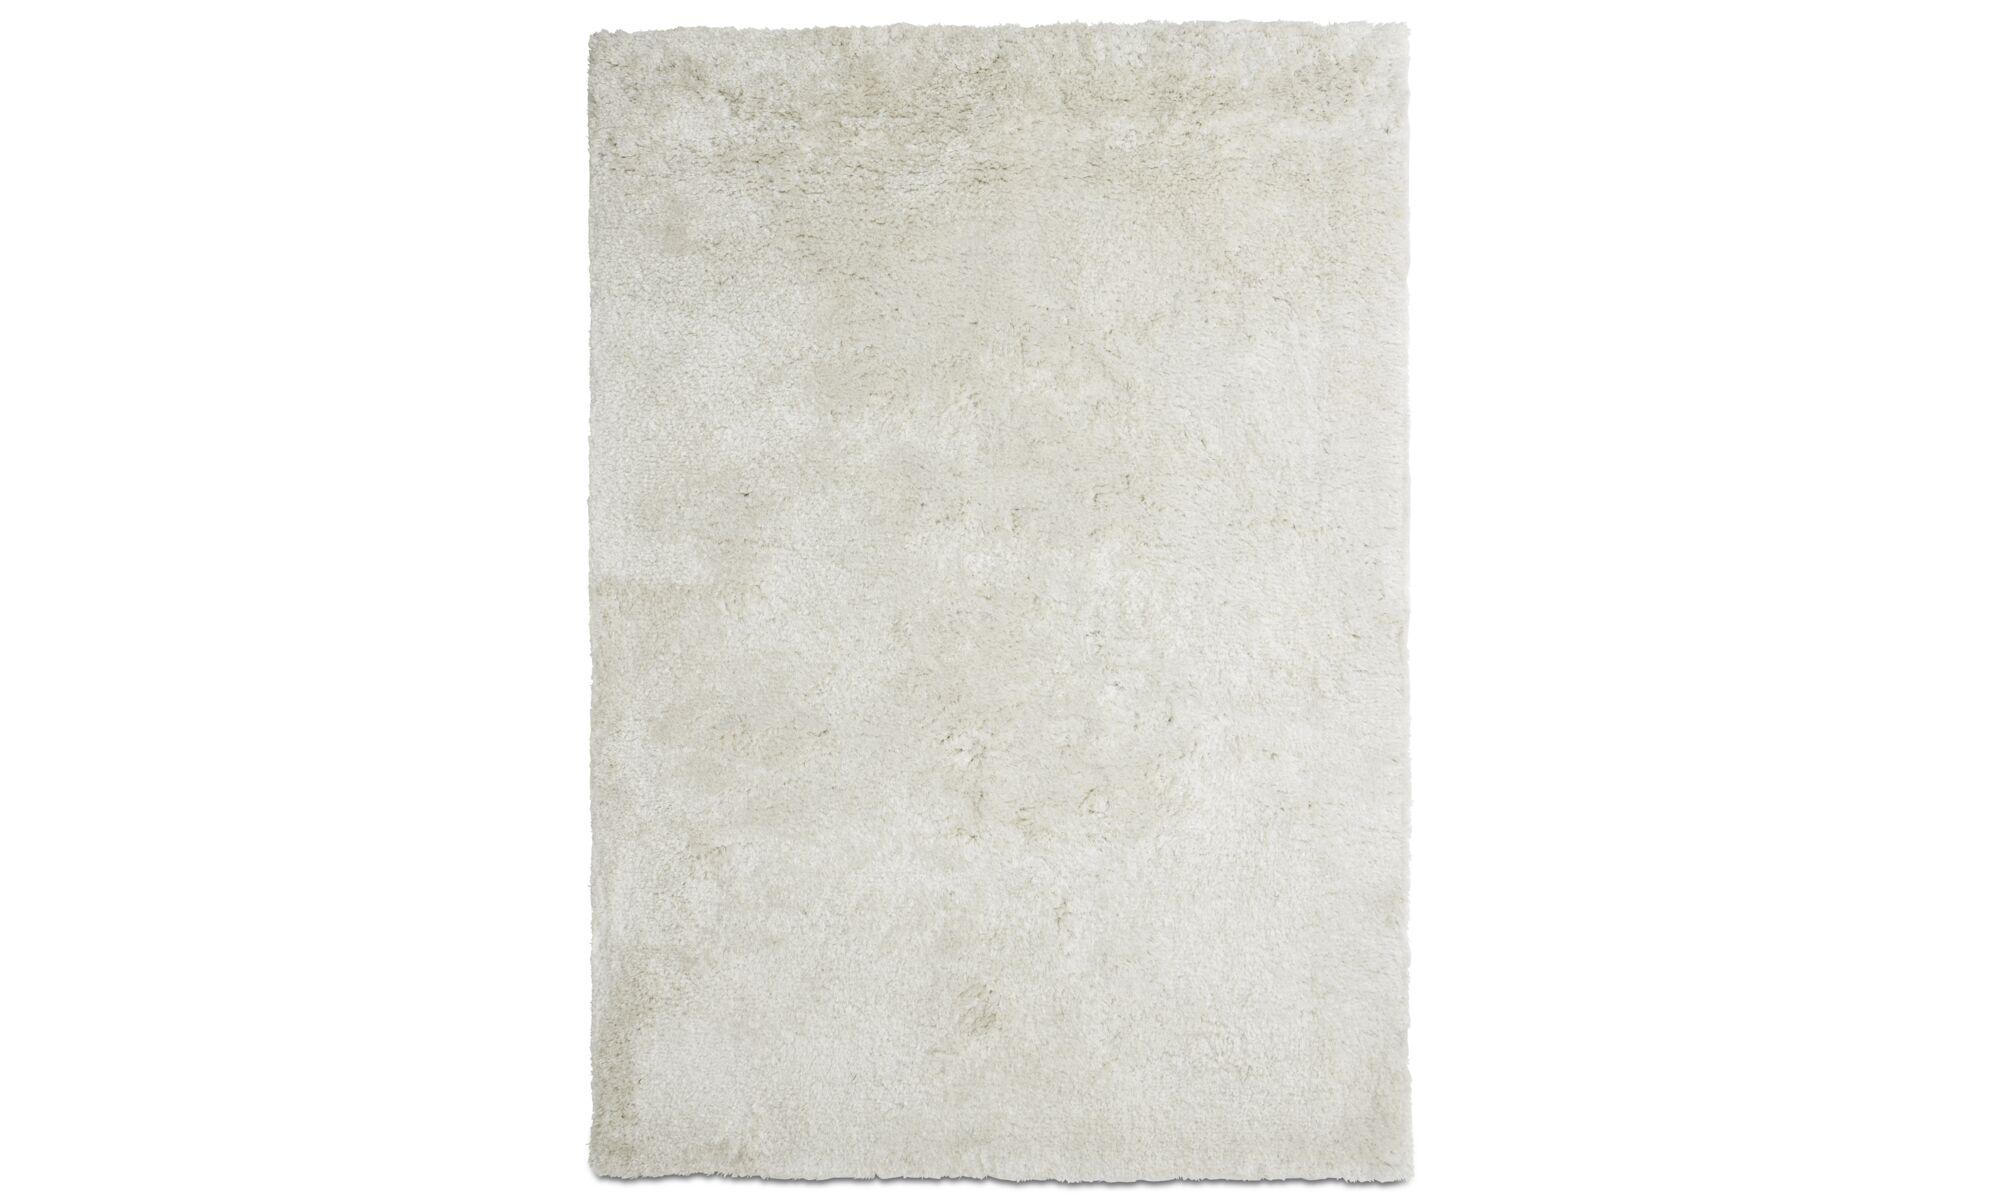 Rugs - Movement rug - rectangular - White - Polyester